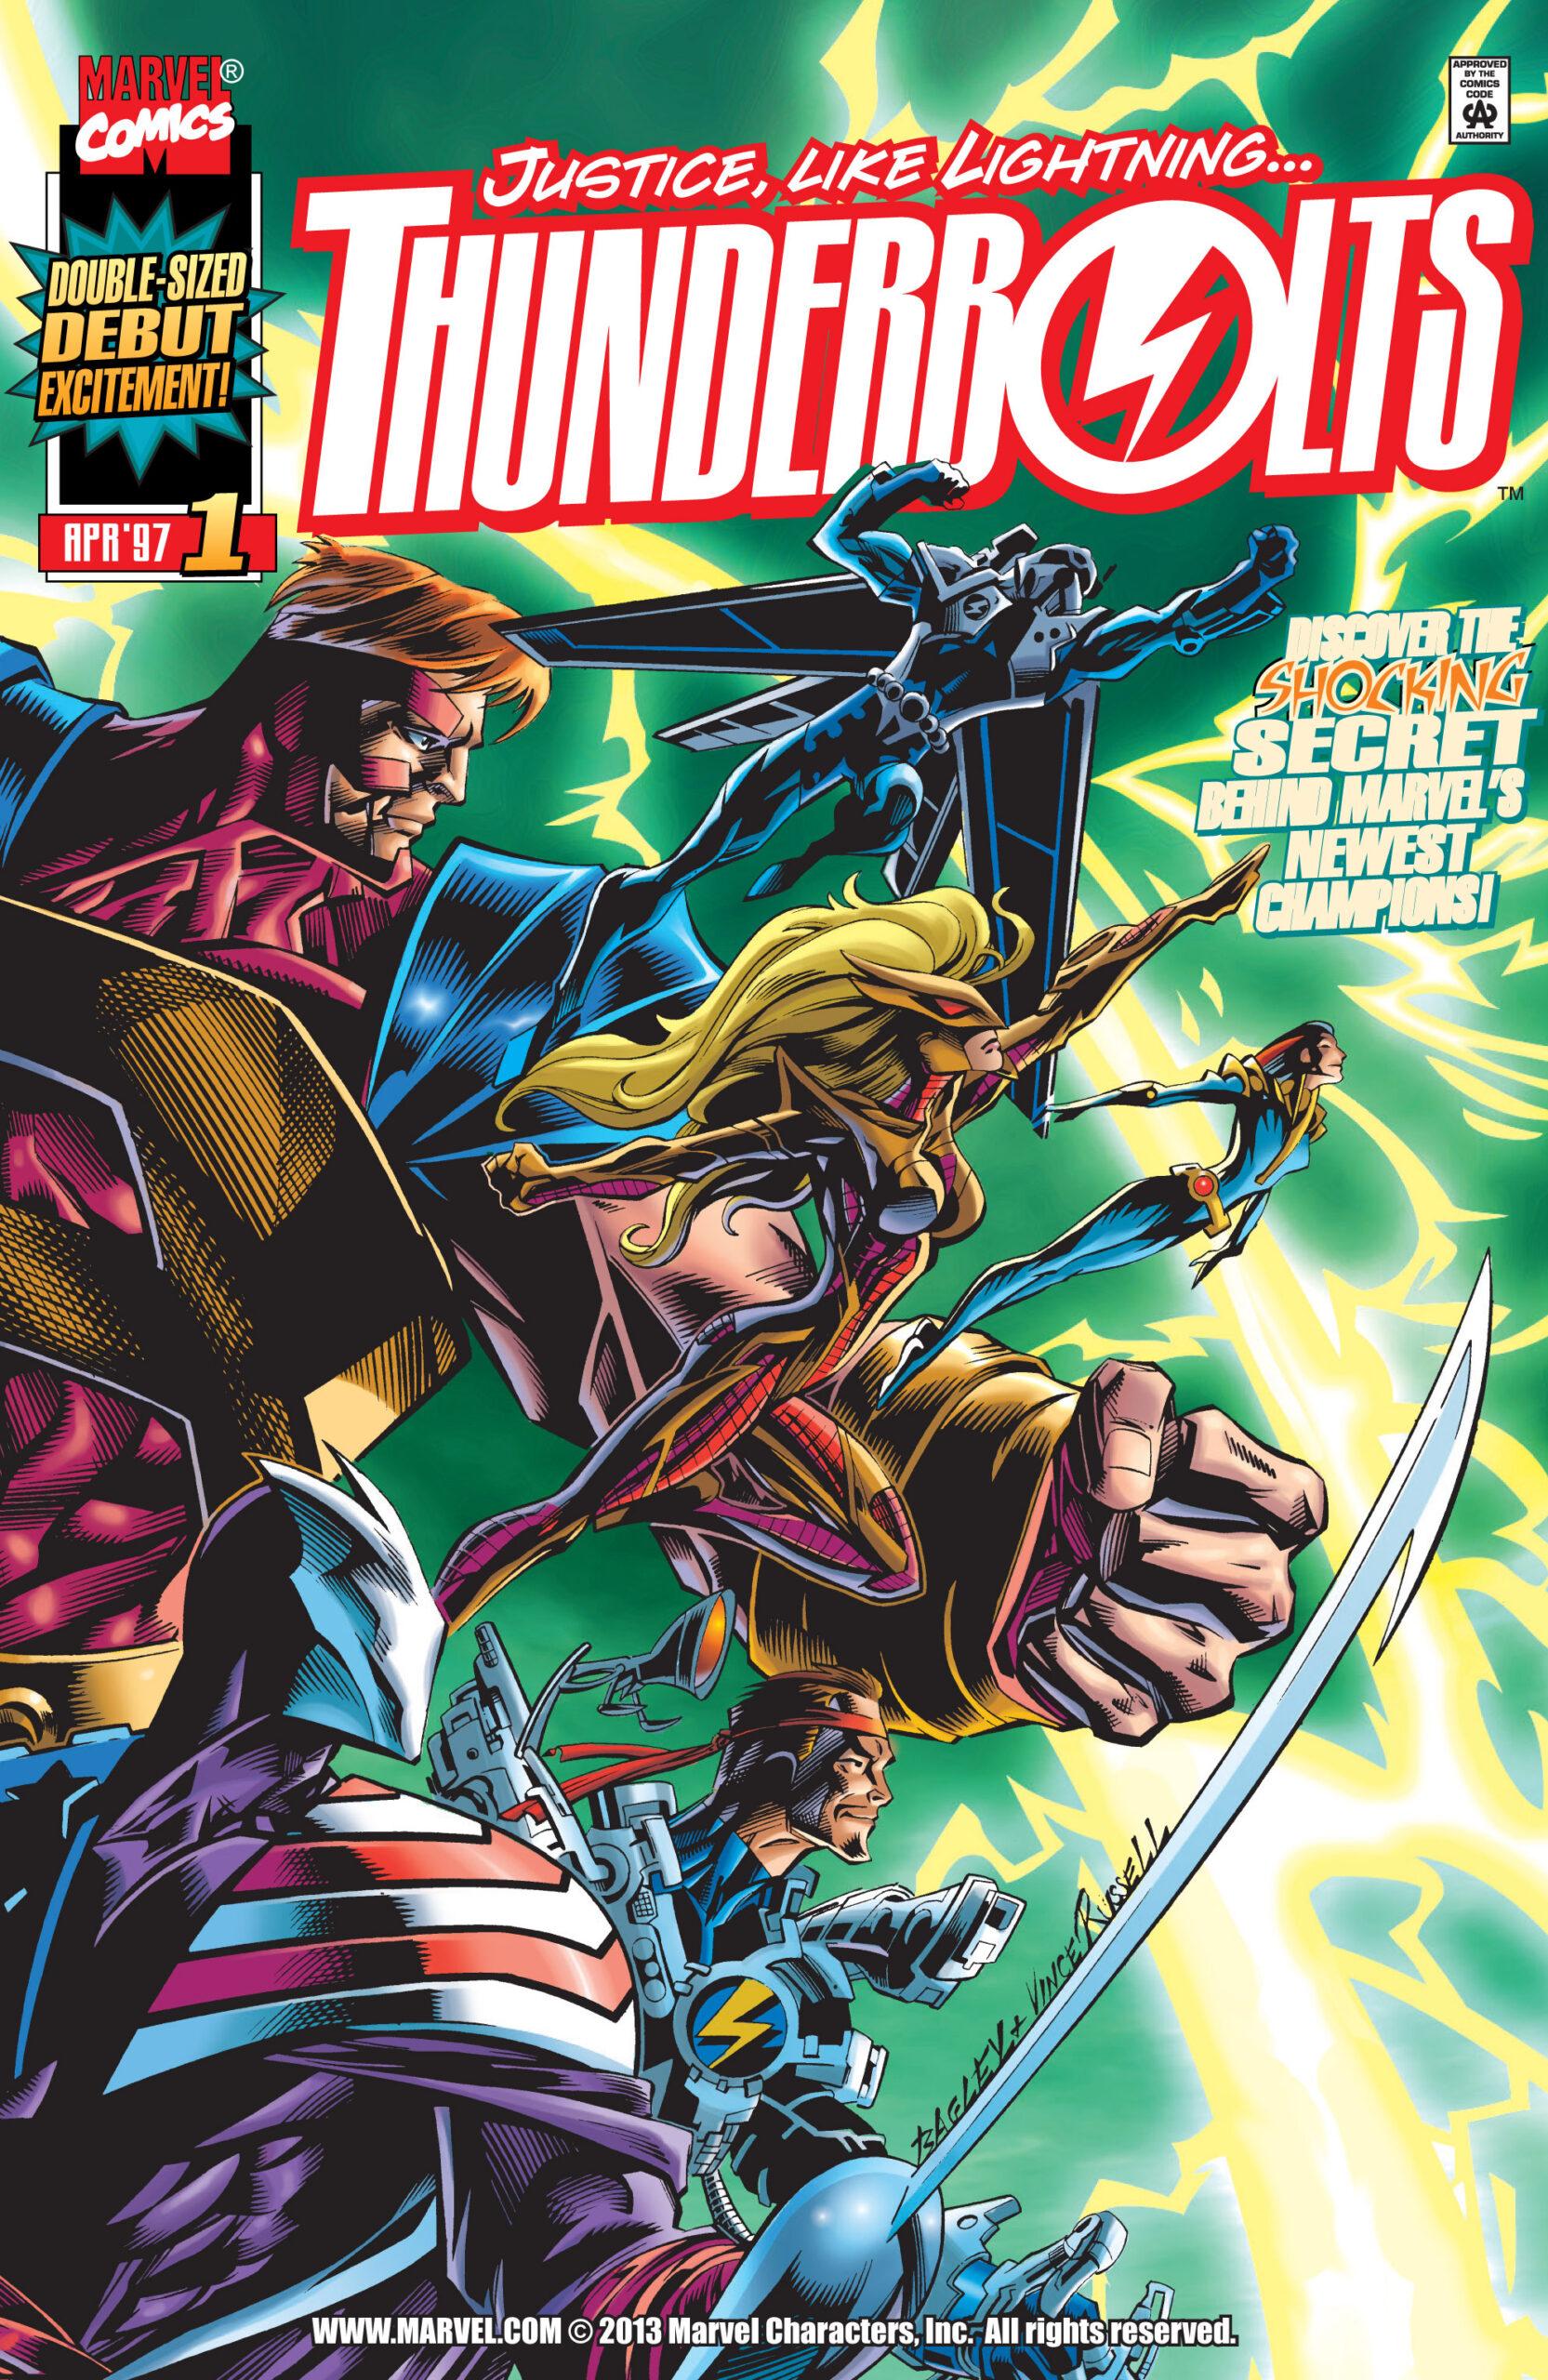 Leer Thunderbolts Volumen 1 Online en Español